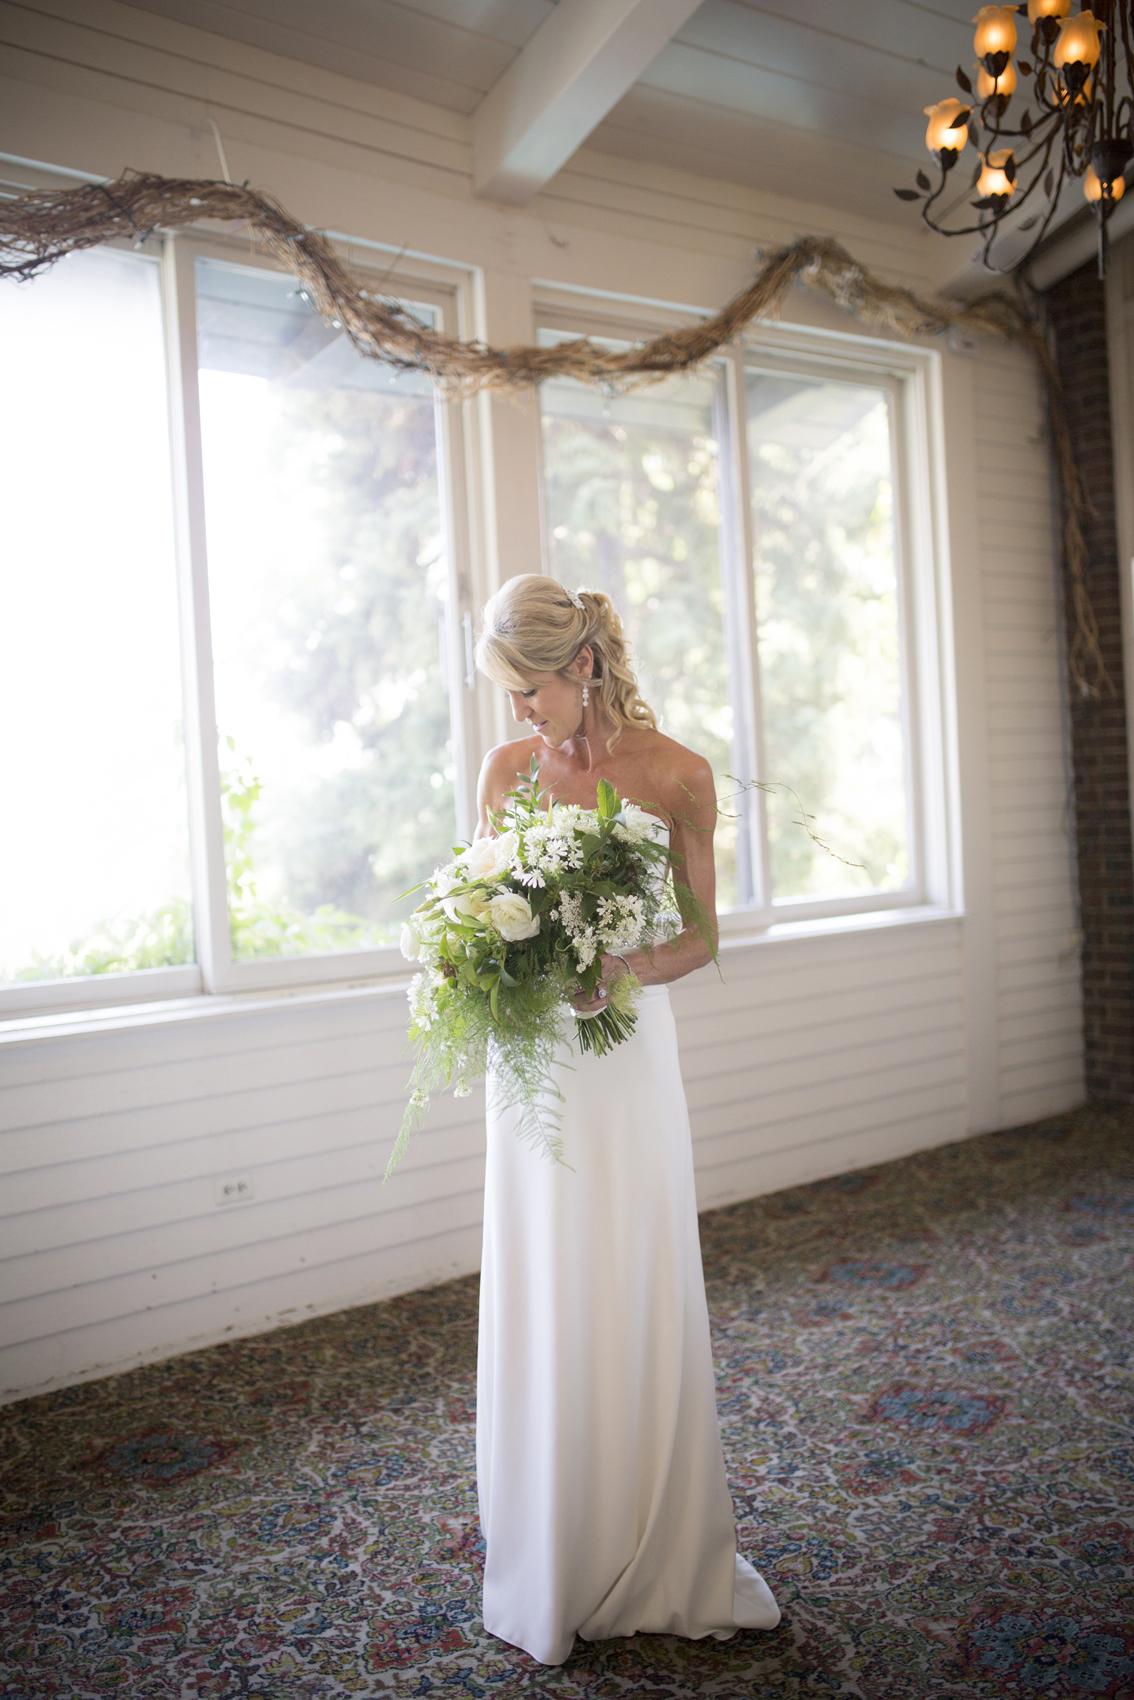 Laurie Schneider Photography